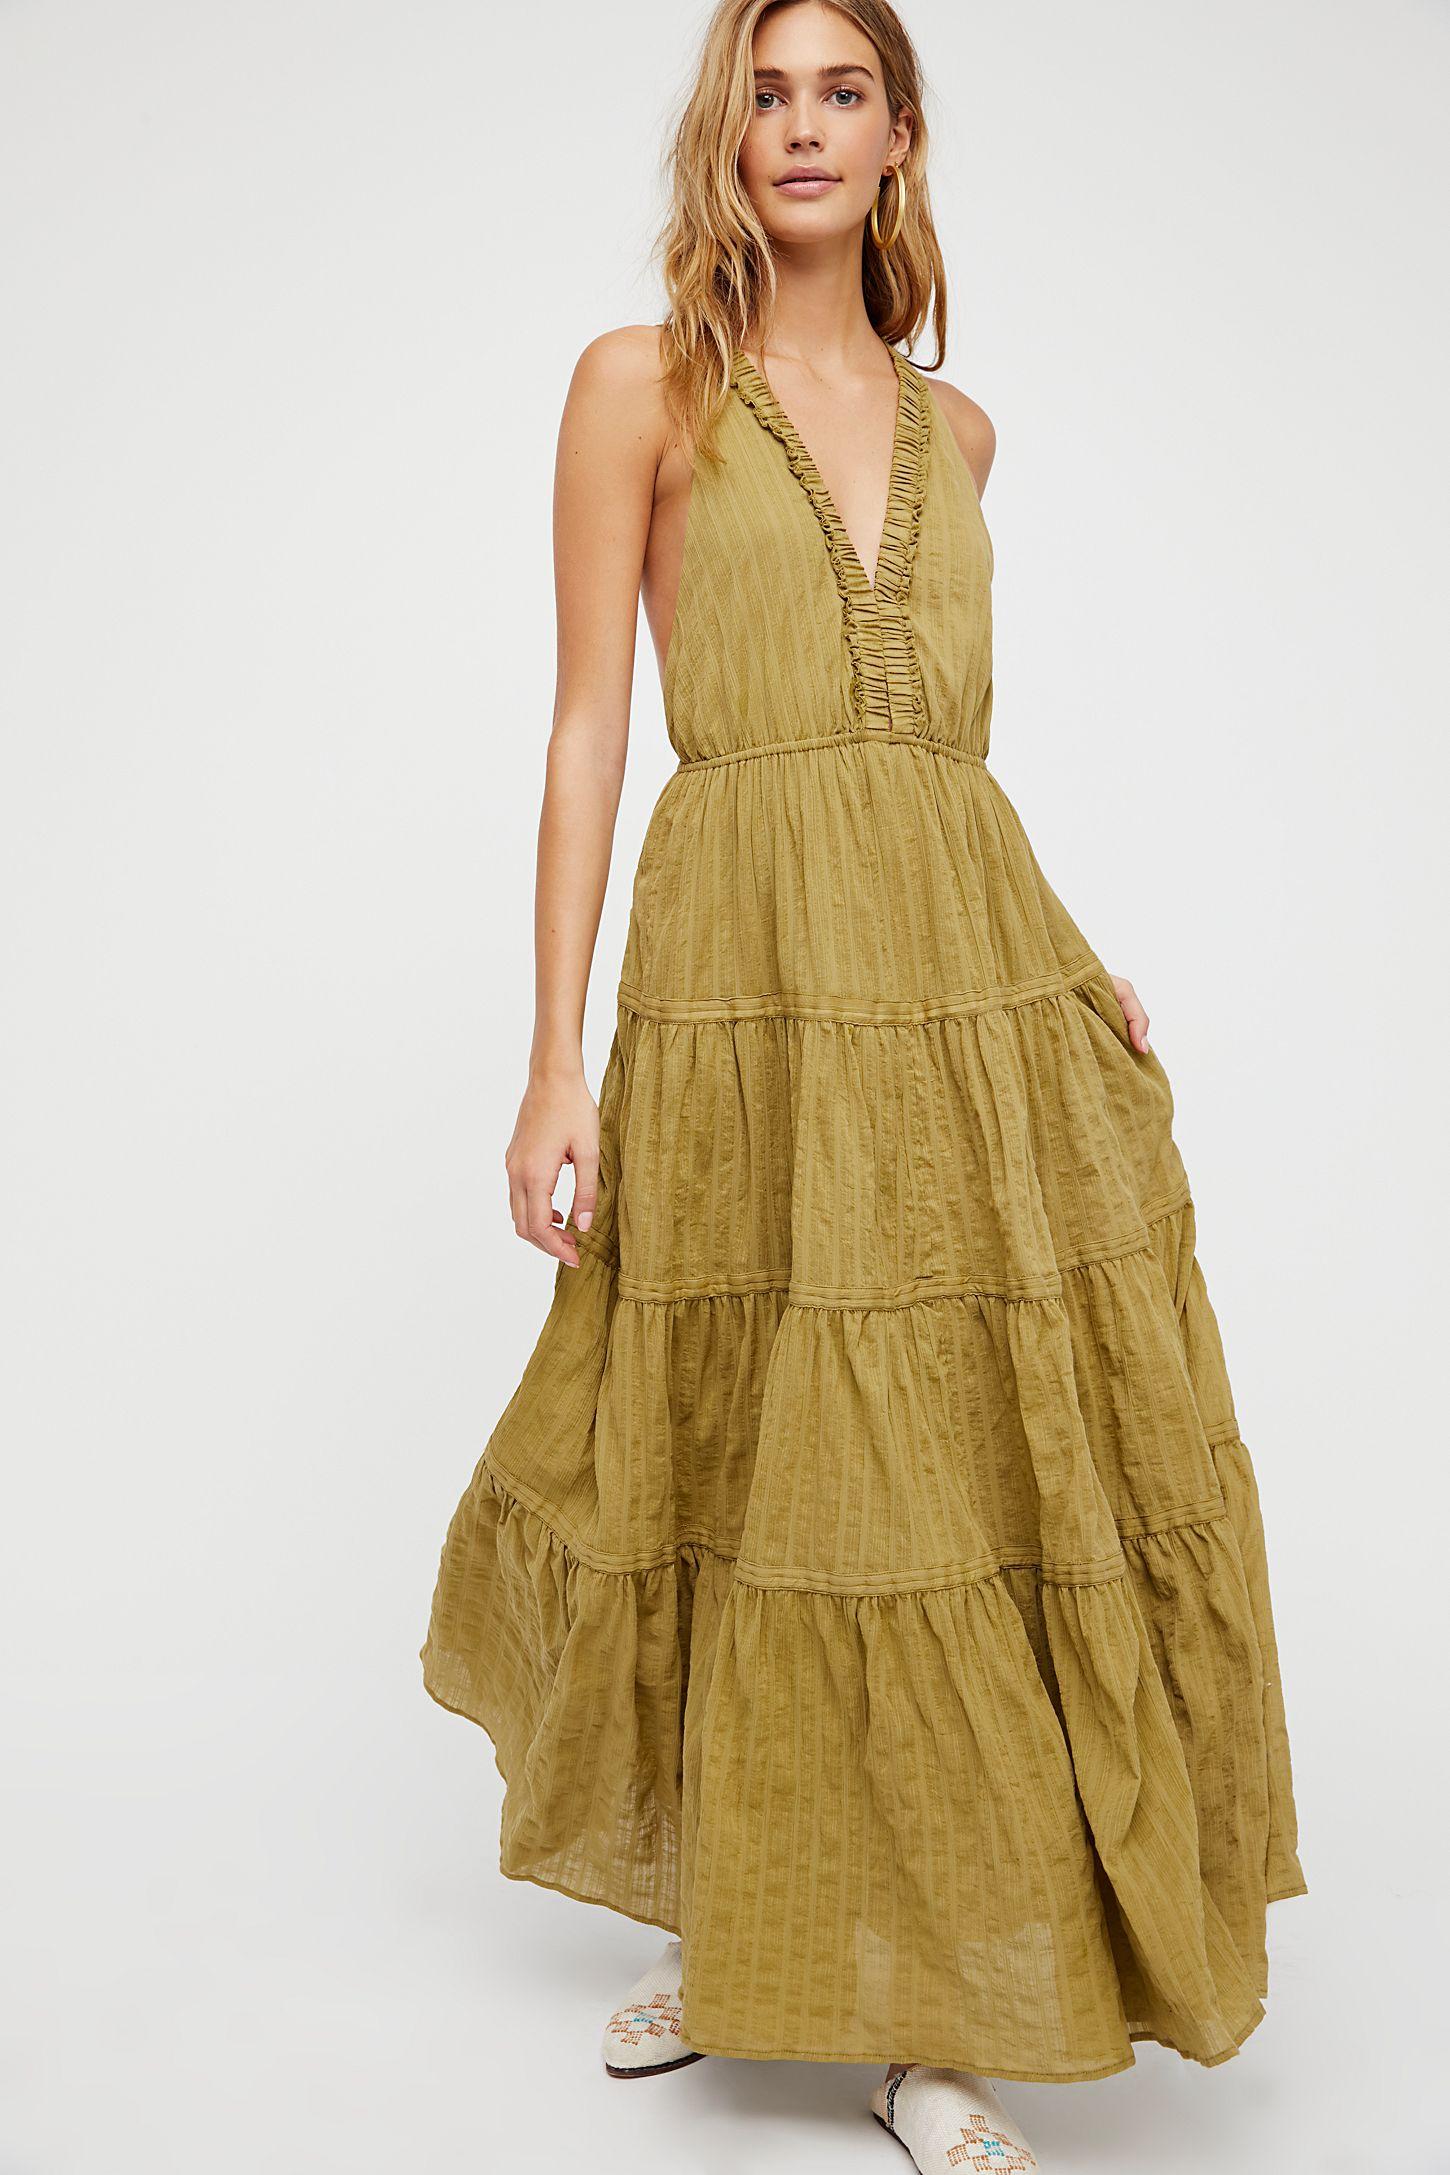 d8e41bc625f9 Maxi Dresses Boston Store - raveitsafe